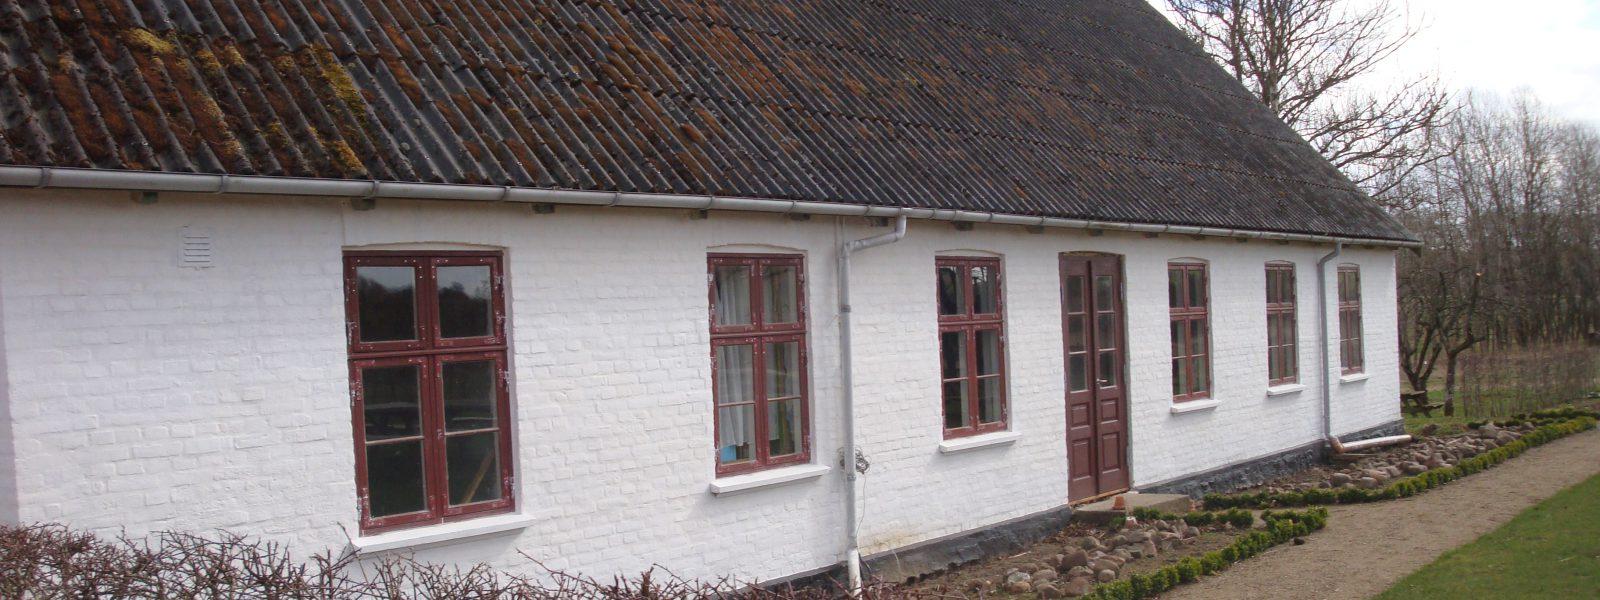 Mølle Maries hus